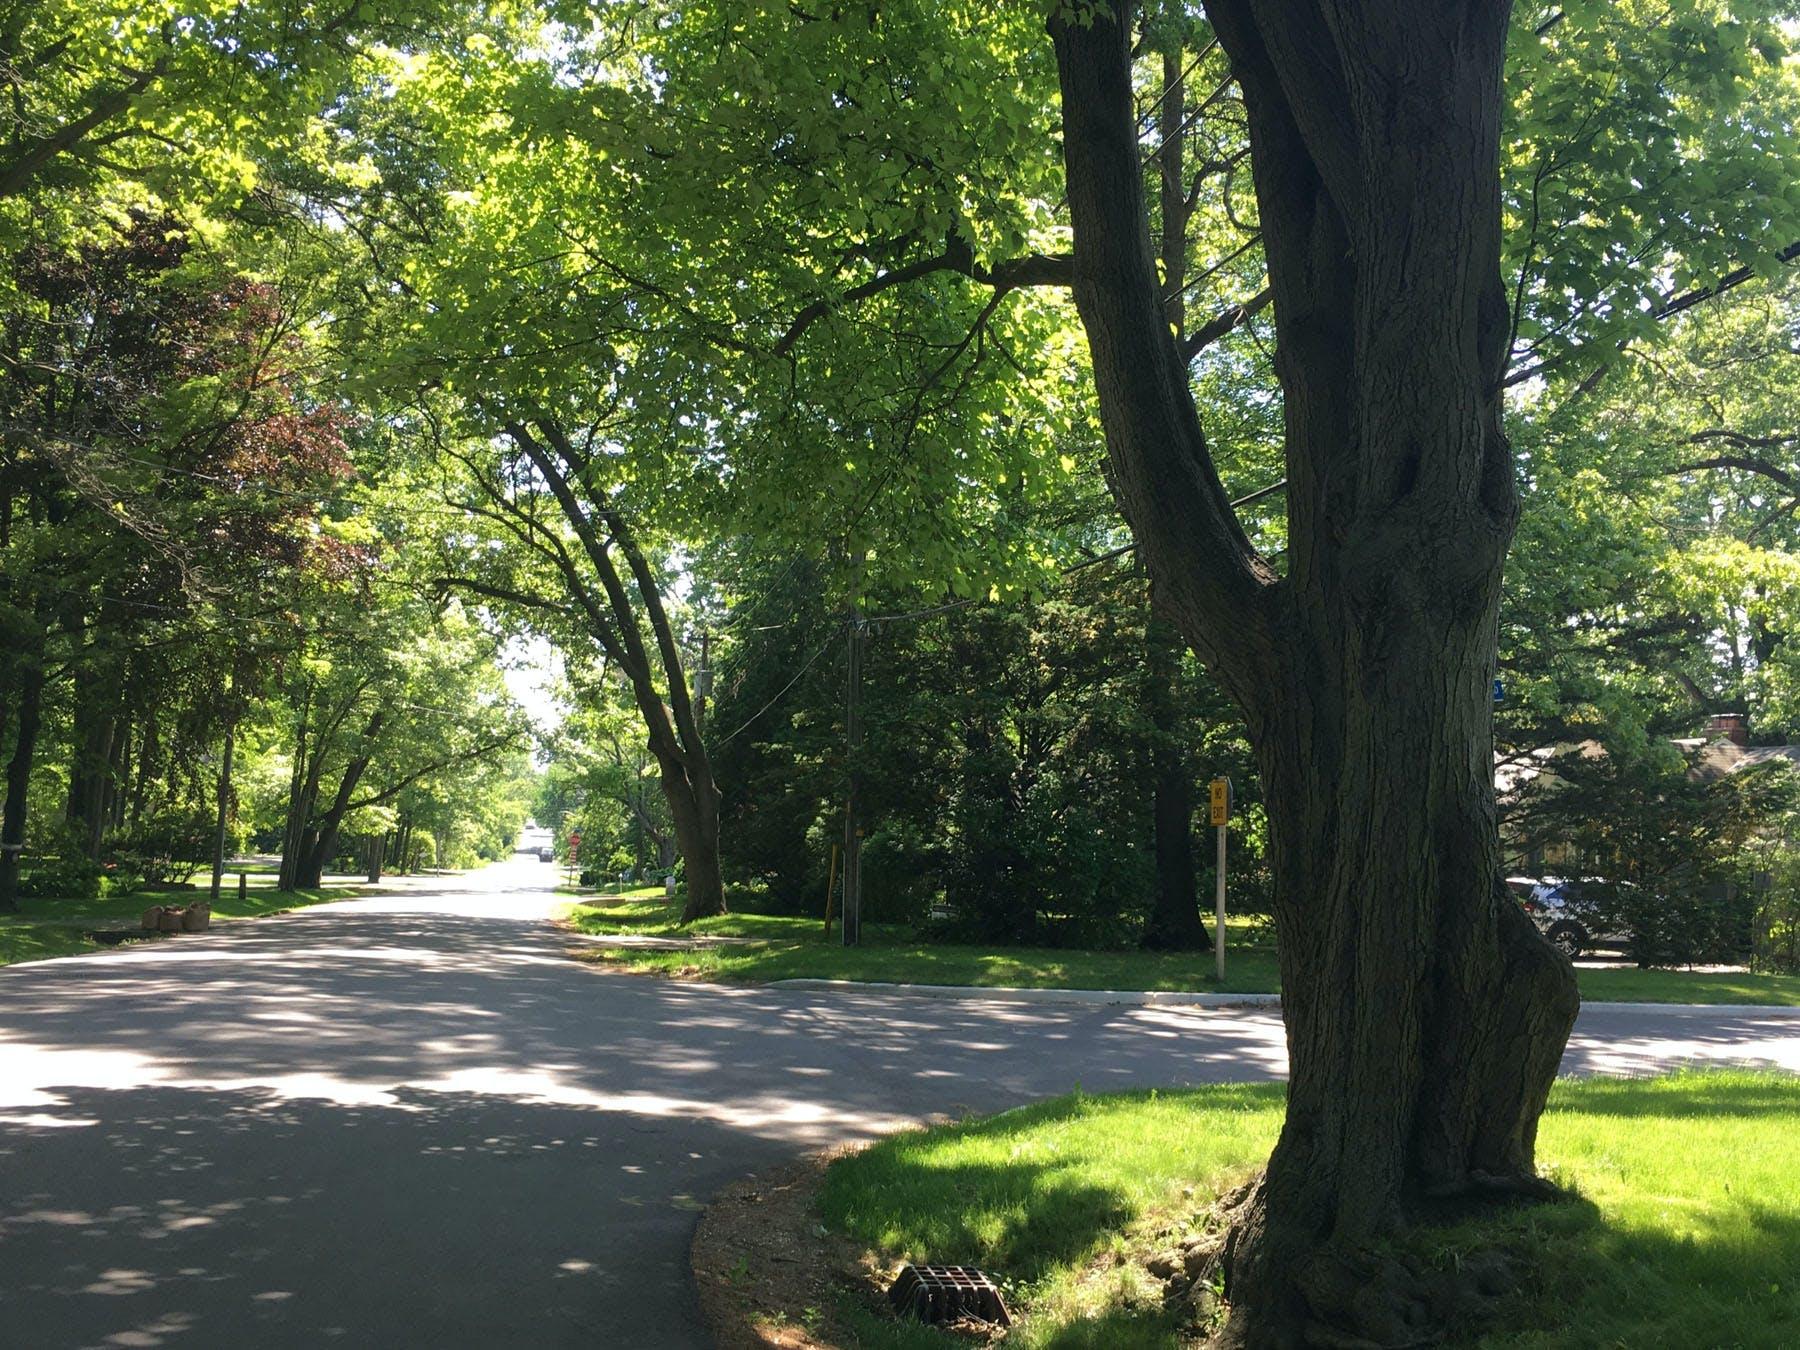 Rural and winding streetscape of Mineola Neighbourhood